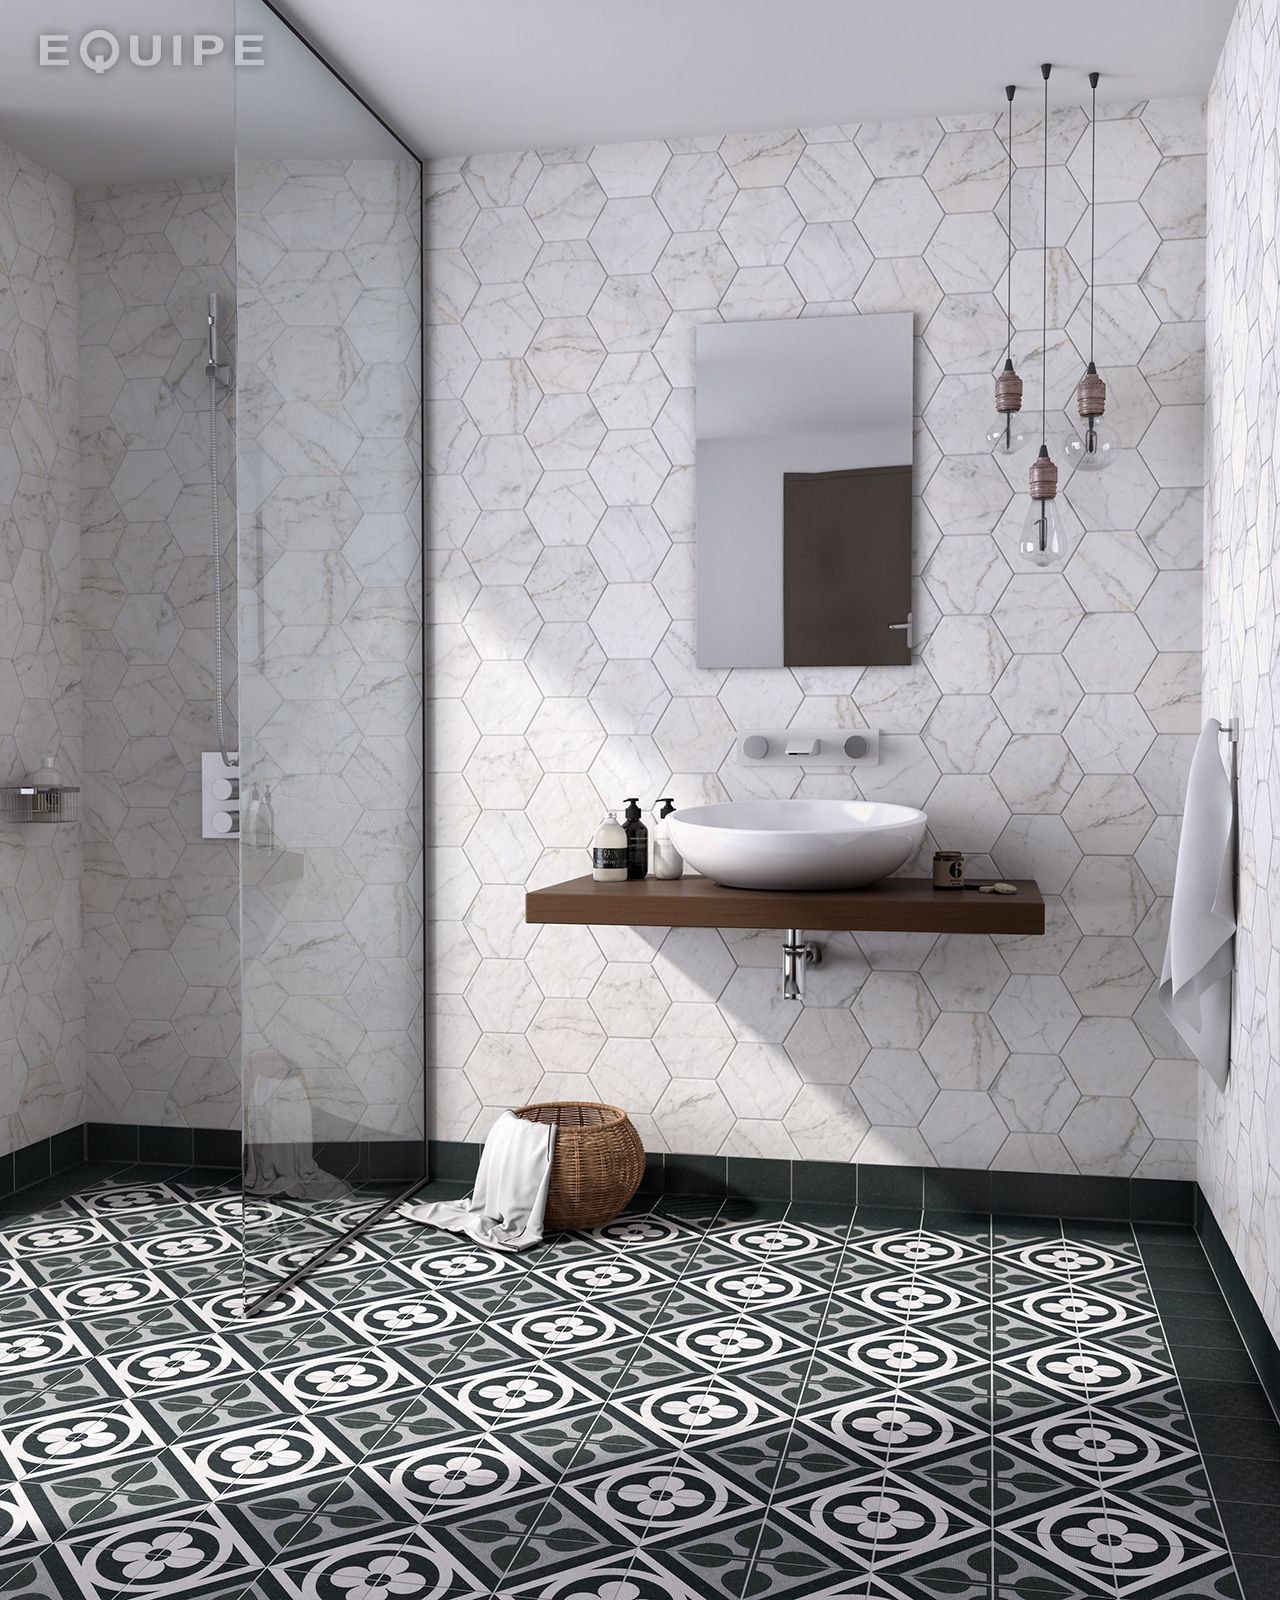 Area 15 Graphite, deco Flower Black 15x15 / Carrara Hexagon 17,5x20. #antislip, #architecture, #square, #tile, #traditional, #architect, #bath, #bathroom floor, #bathroom flooring, #bathroom tile, #ceramic tile, #ceramic tiles, #ceramic, #contemporary, #contractor, #design, #house, #industrial, #interior design, #interior designer, #kitchen, #kitchen tile, #modern, #hexagon, #equipe